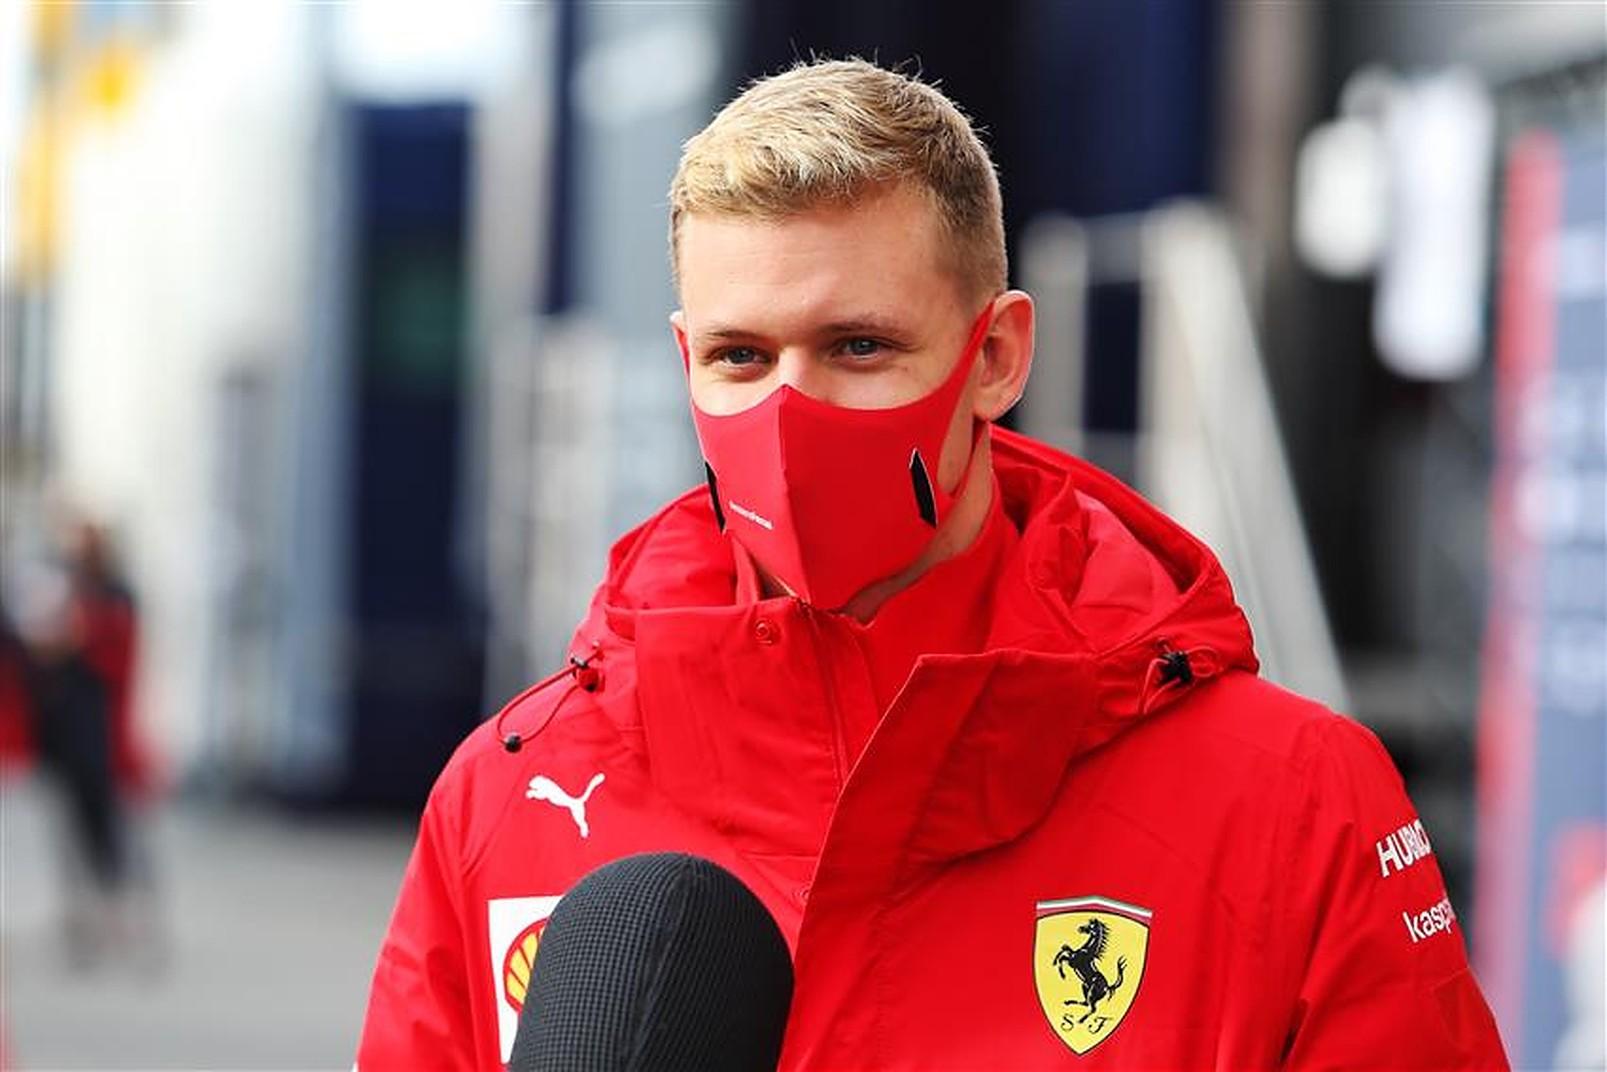 Mick Schumacher Ferrari F1 - Formula1News.co.uk